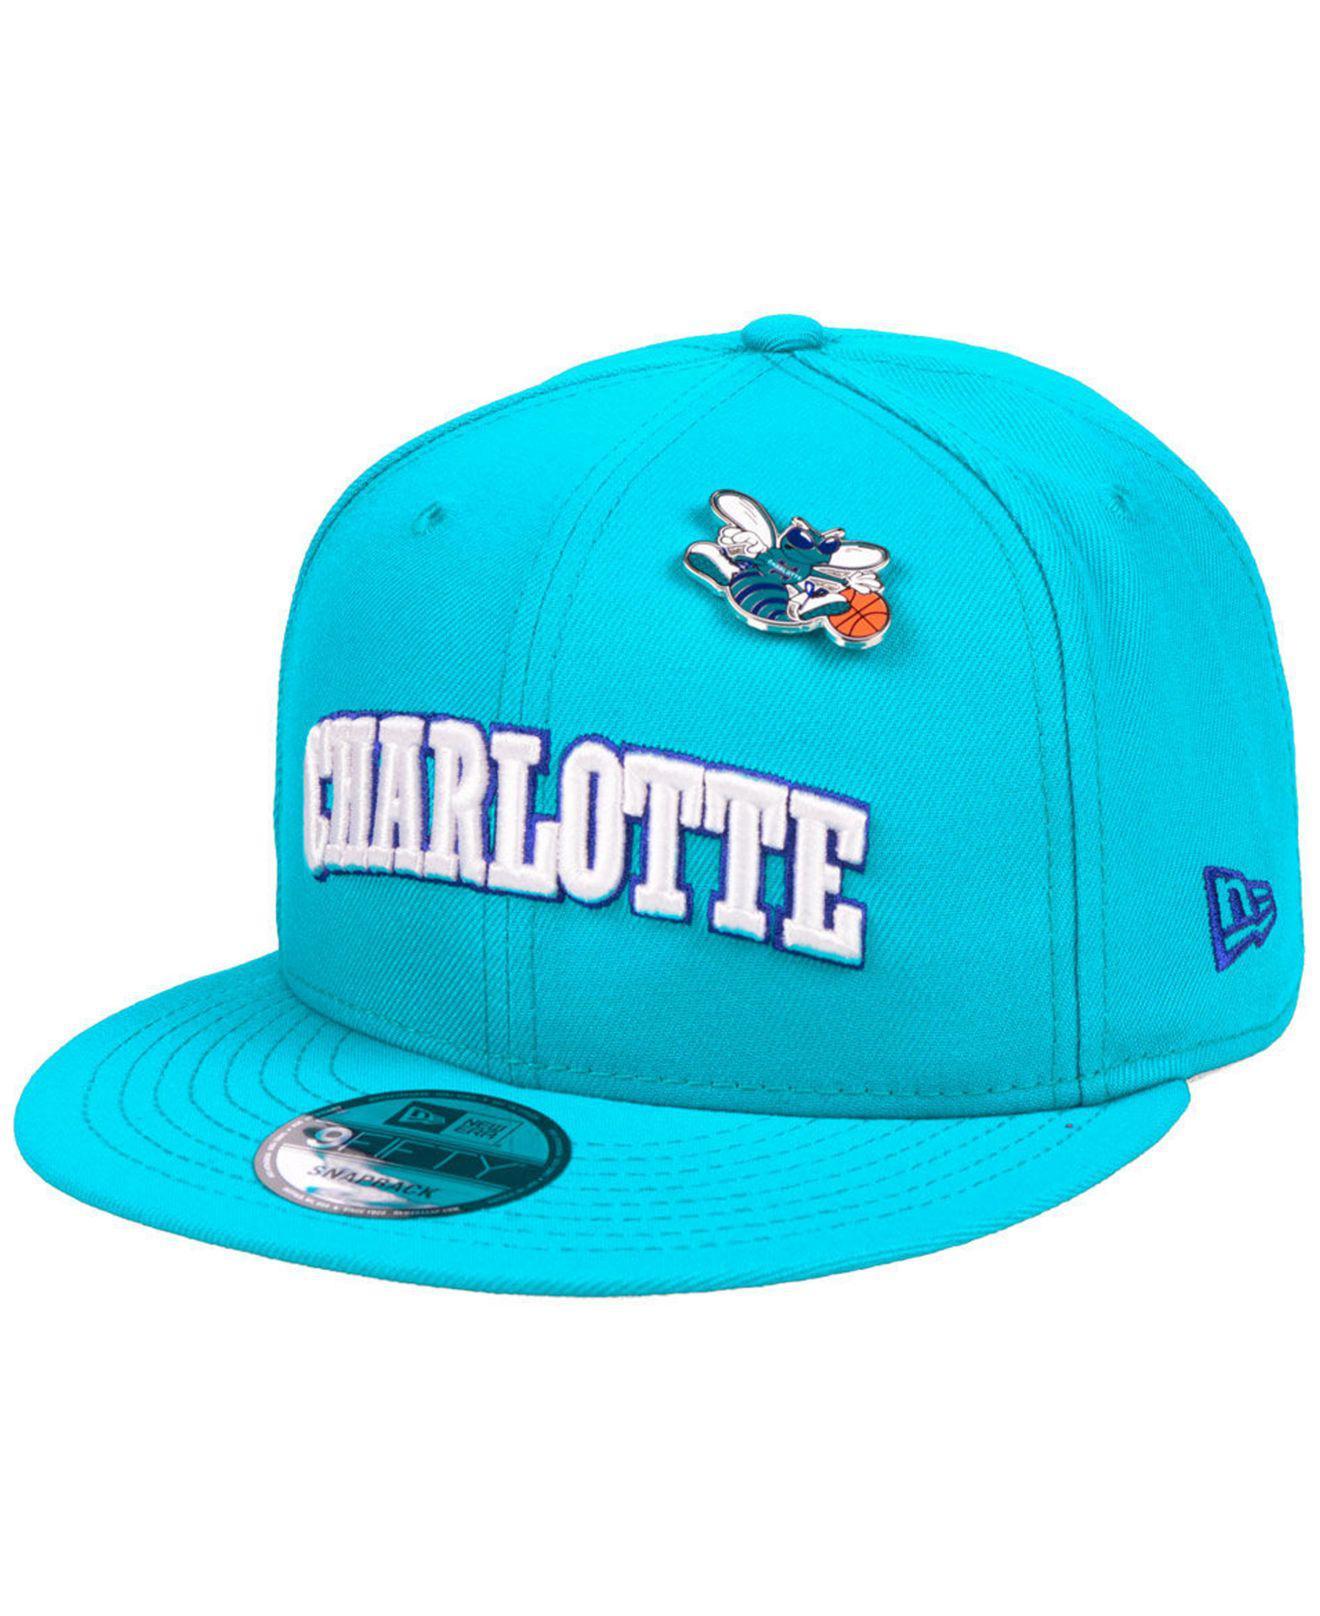 KTZ. Men s Blue Charlotte Hornets Hardwood Classic Nights Pin 9fifty  Snapback Cap 41a46dded